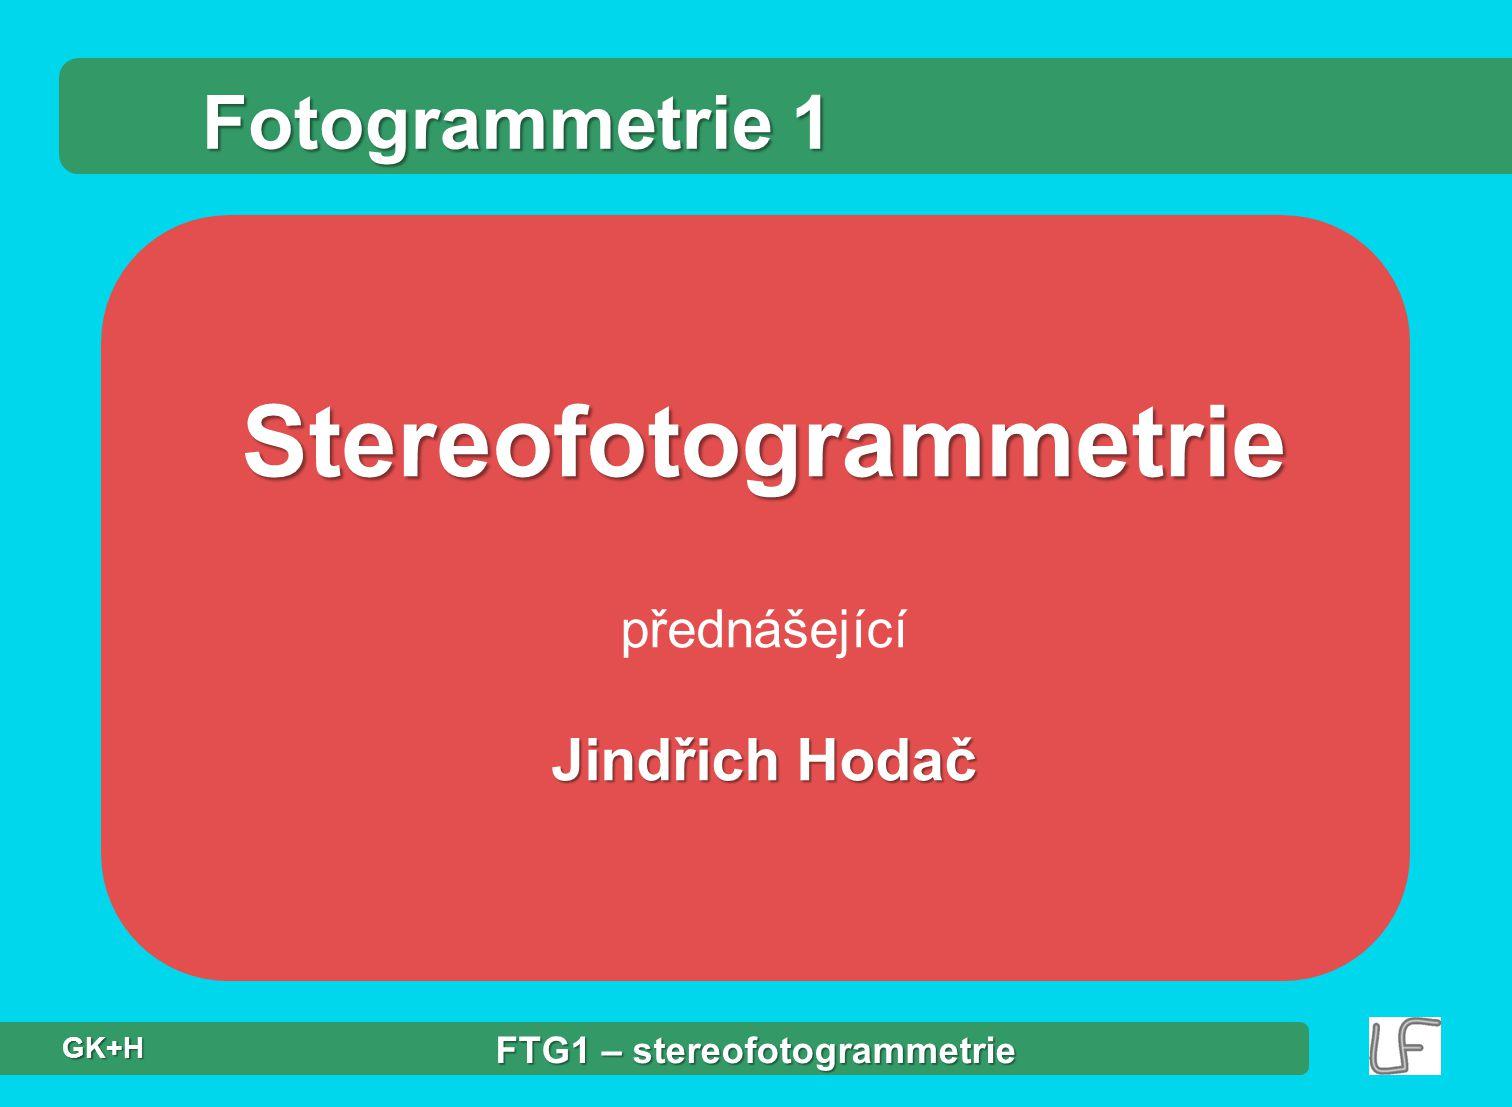 Stereofotogrammetrie FTG1 – stereofotogrammetrie